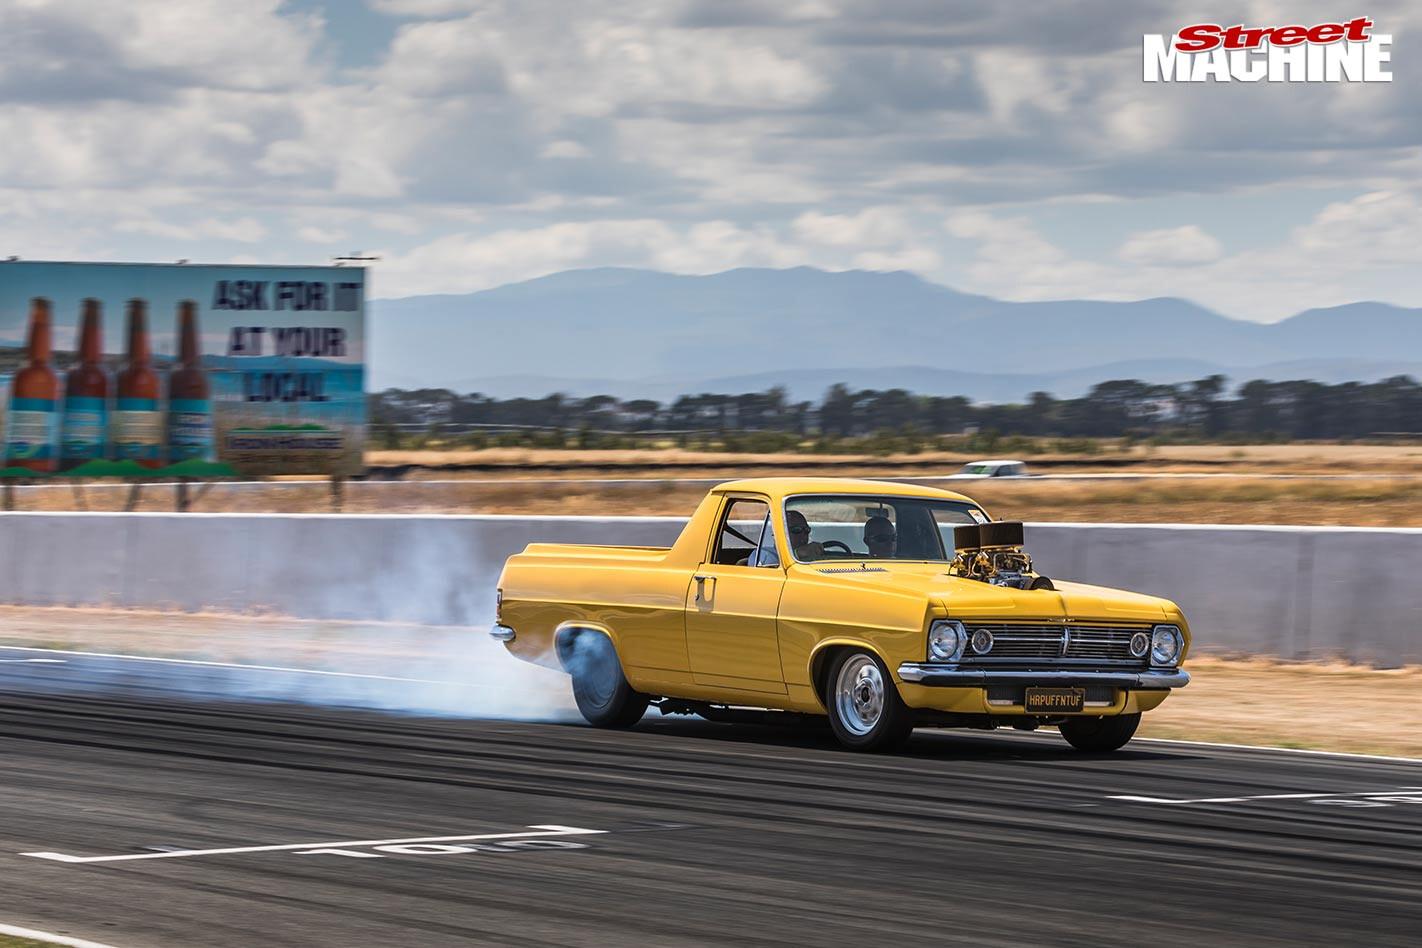 Holden ute at powercruise